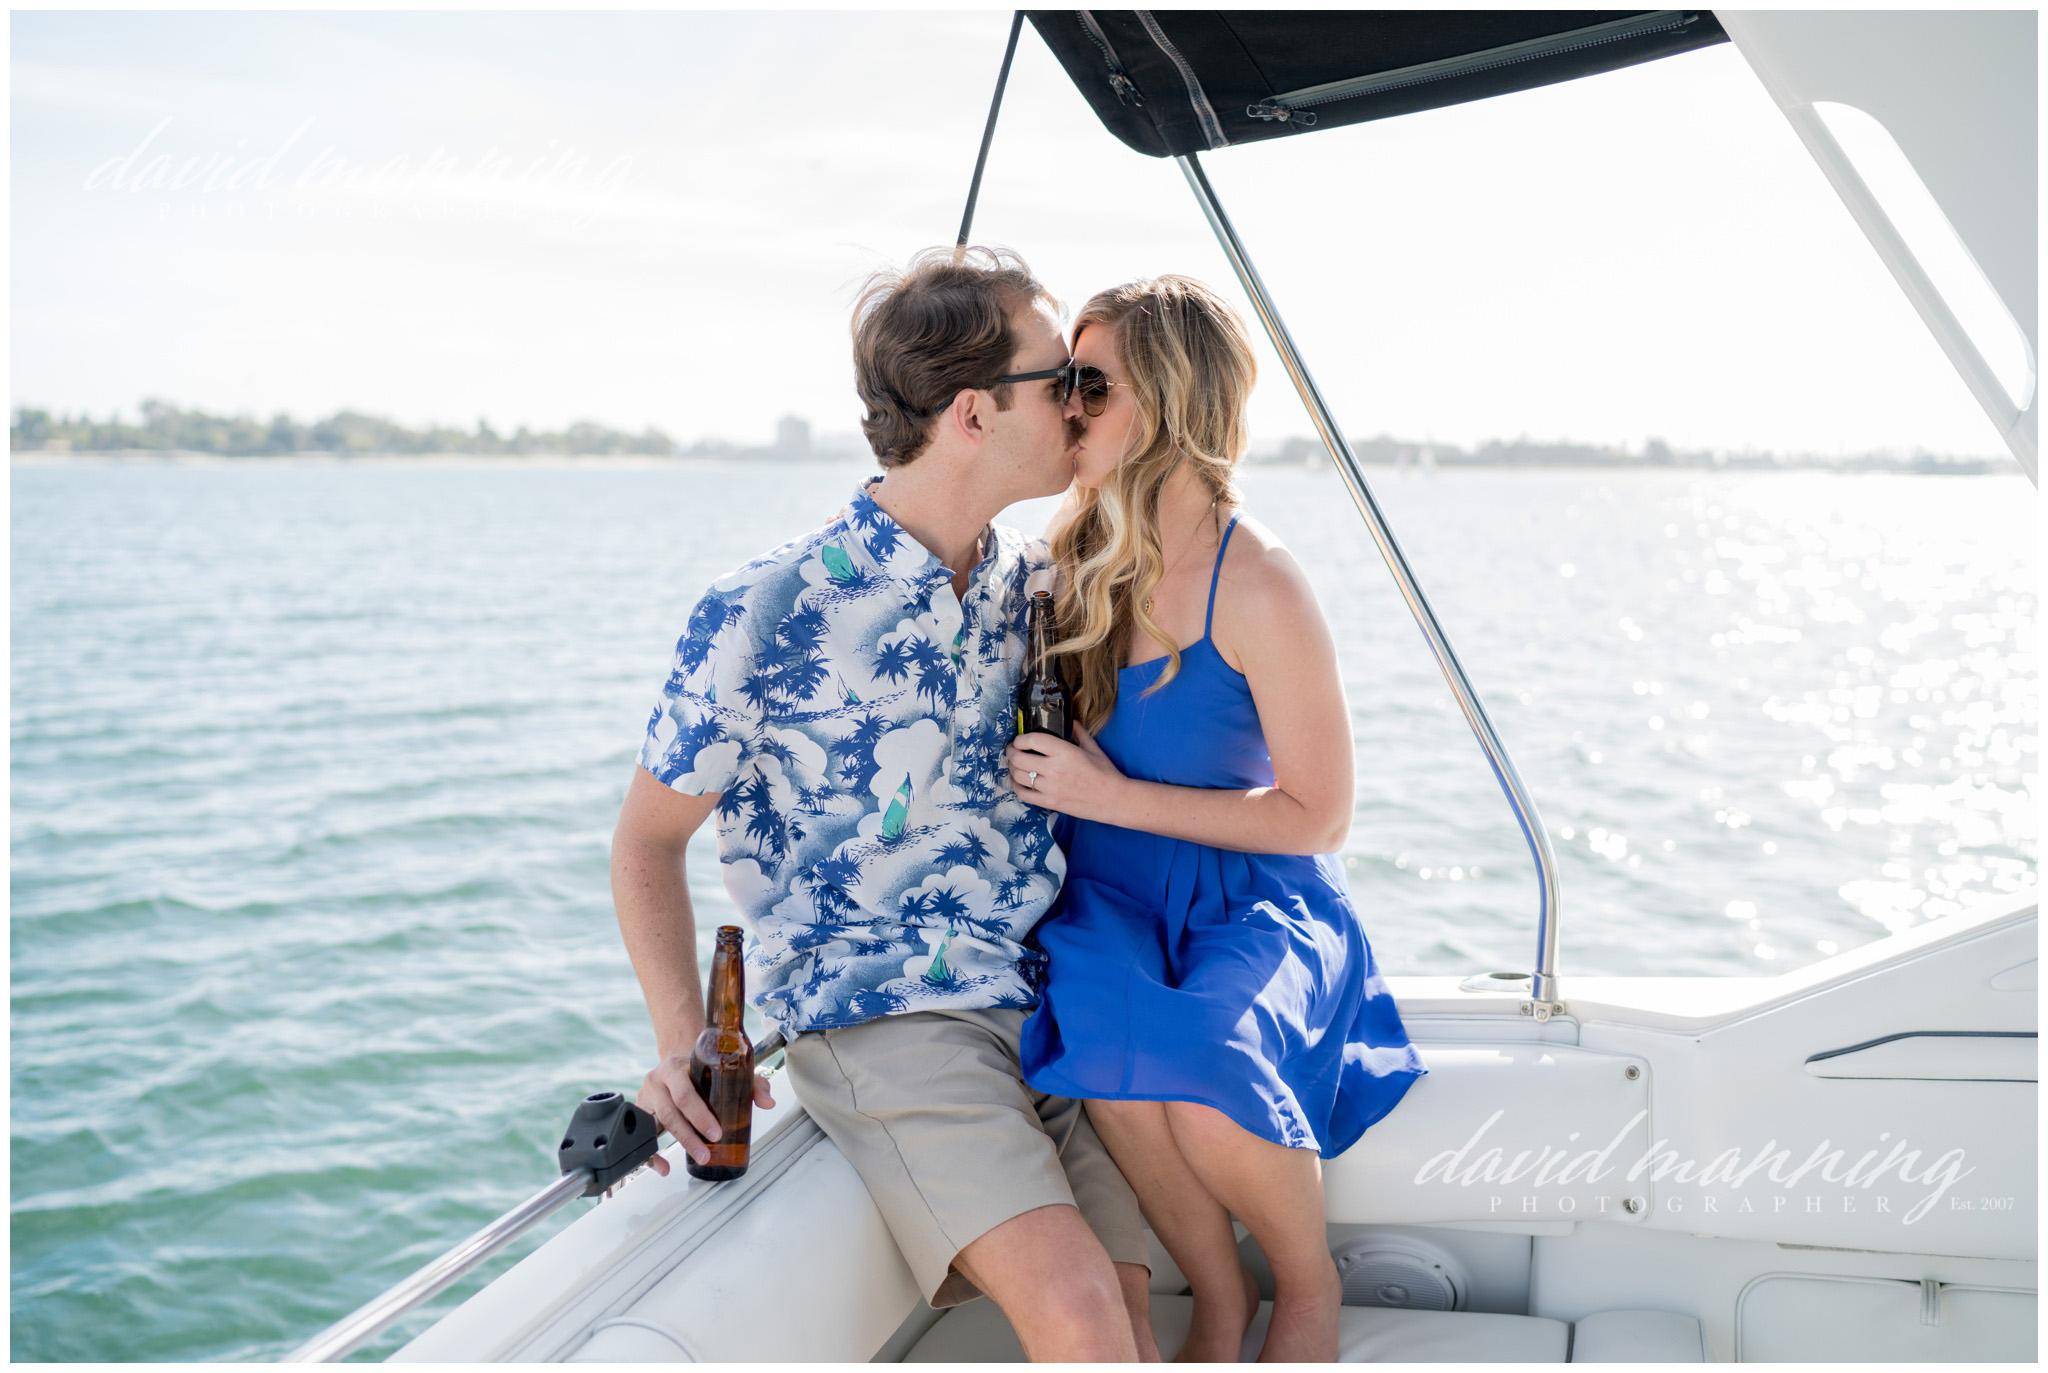 Alyssa-Taylor-Engagement-David-Manning-Photographer-0009.JPG